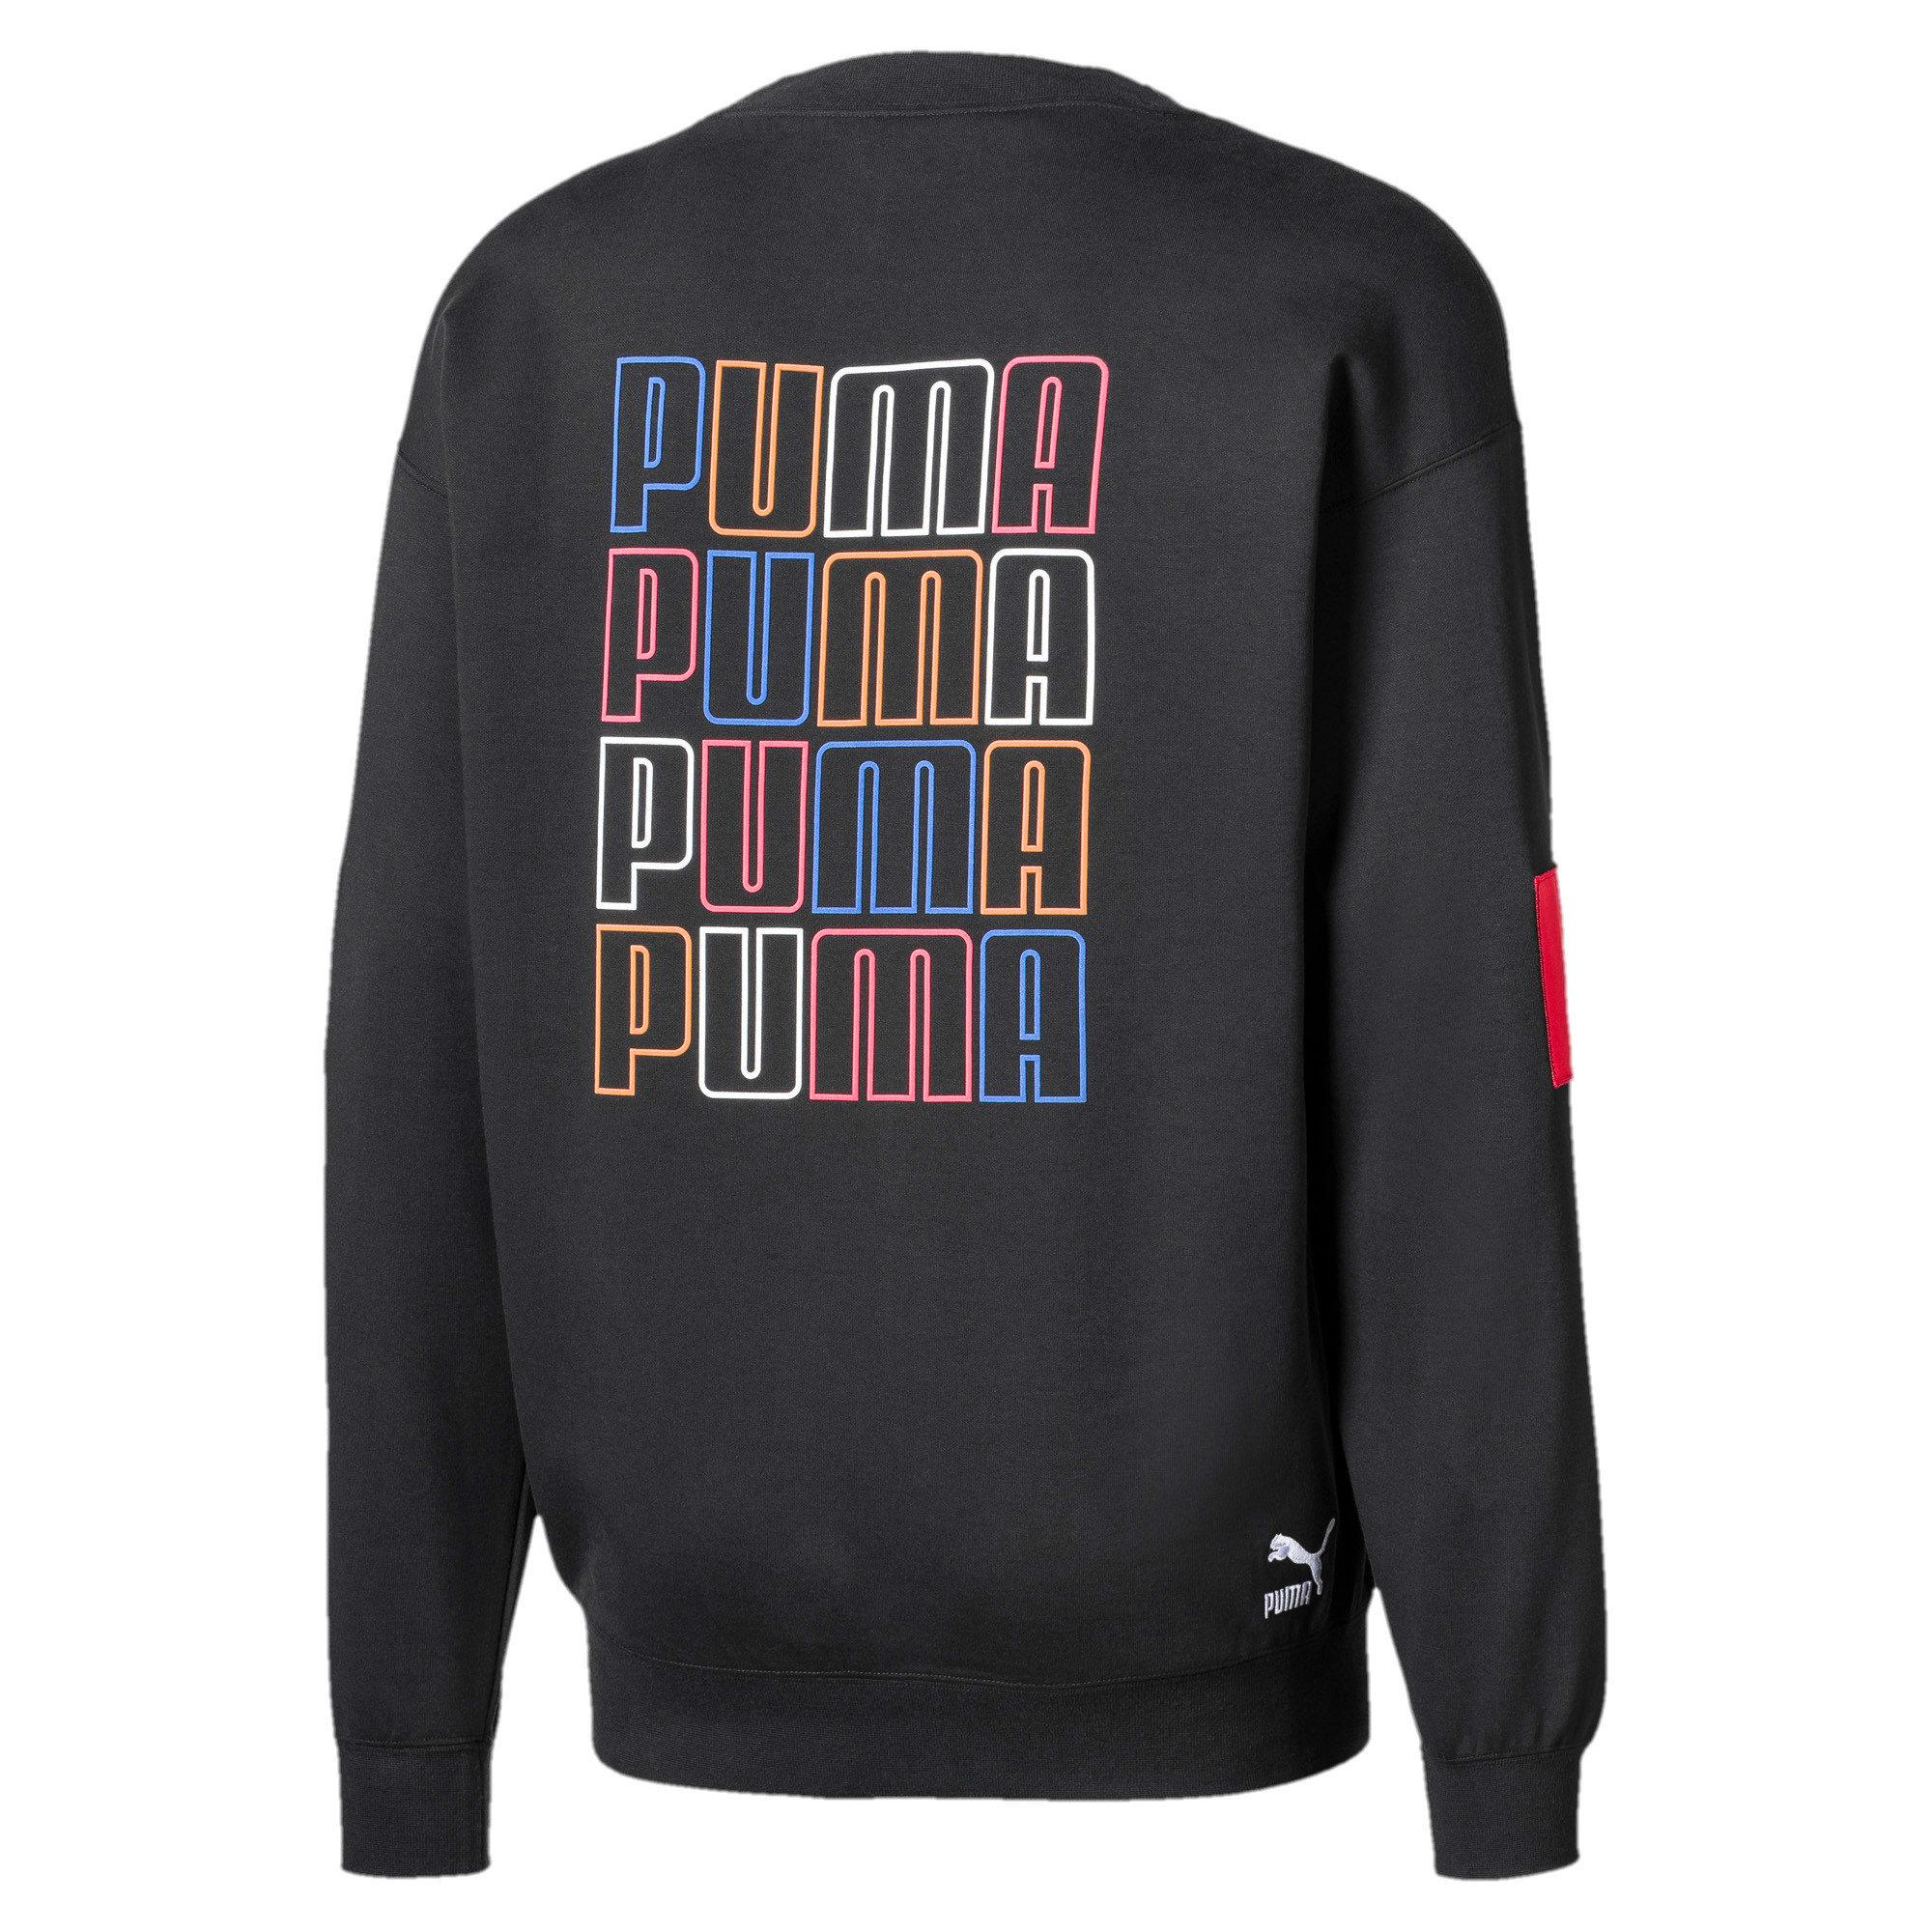 Thumbnail 2 of Men's Crew Sweater, Puma Black, medium